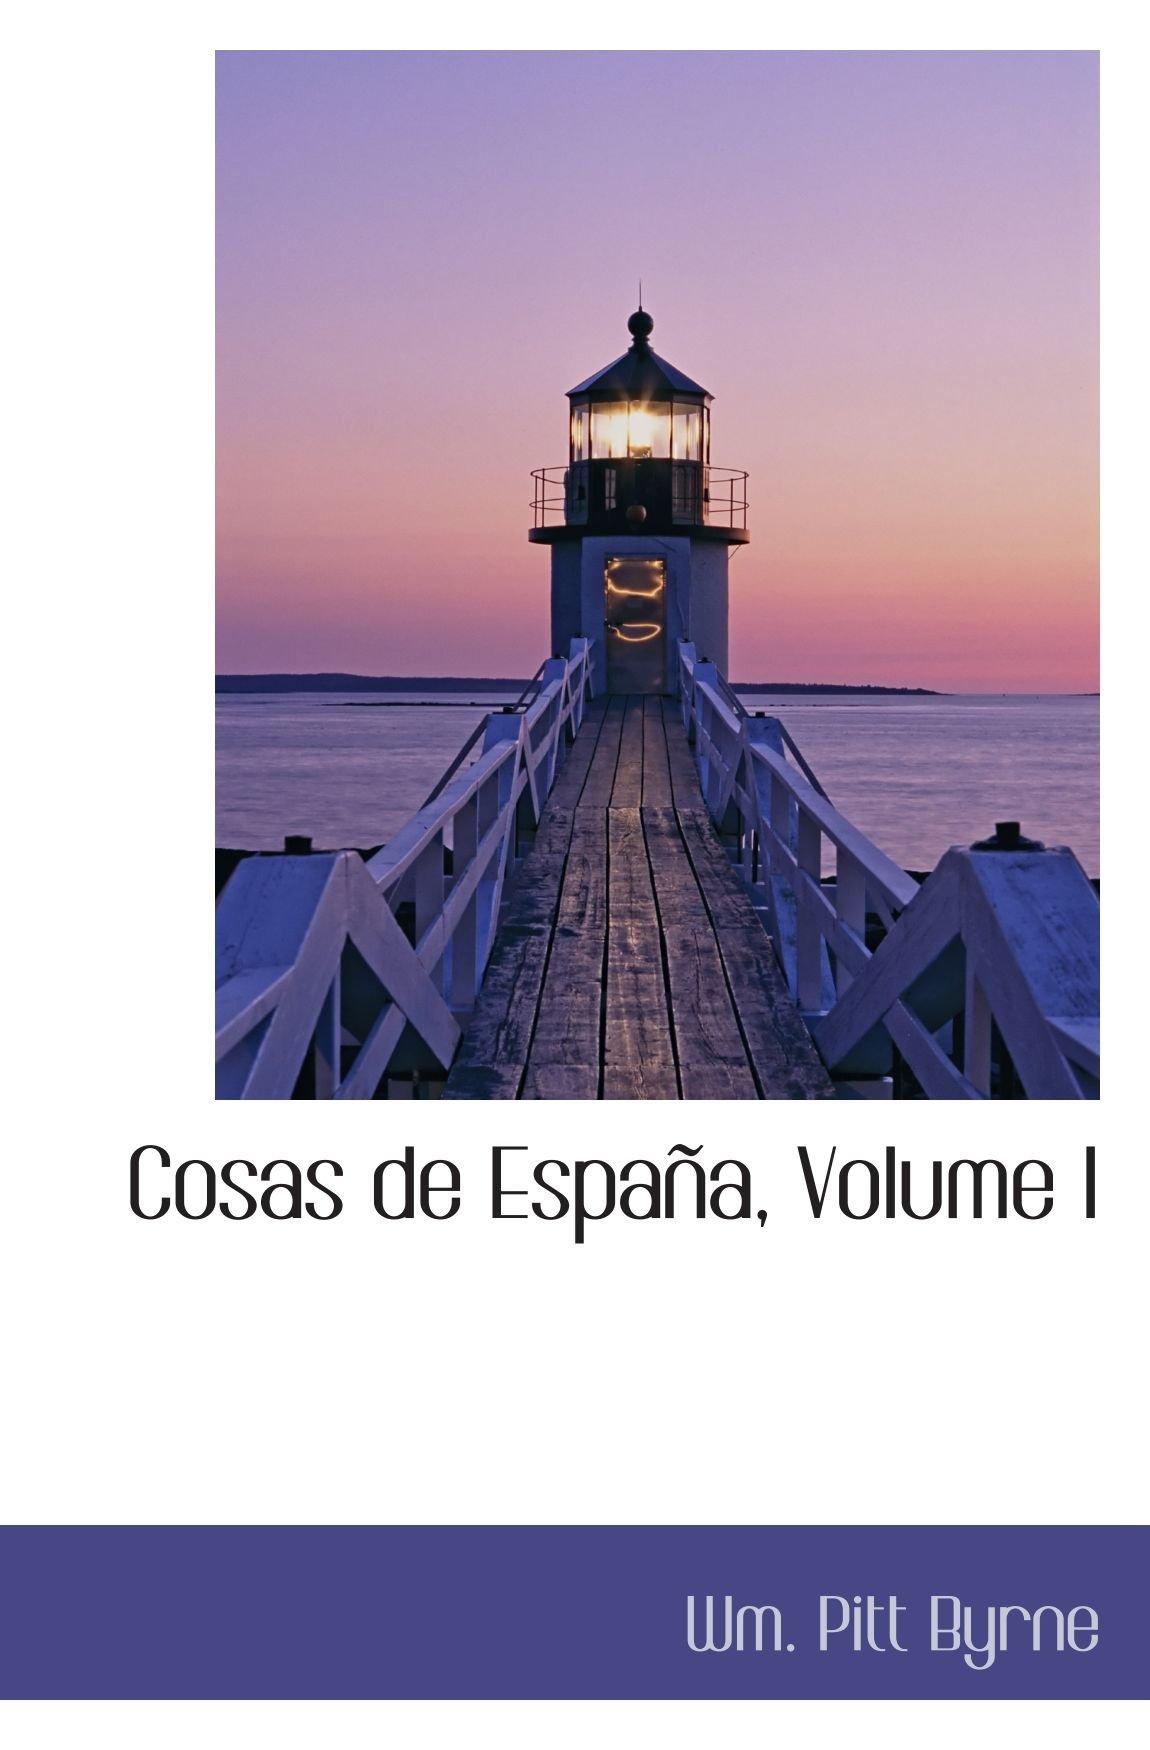 Cosas de España, Volume I: Amazon.es: Byrne, Wm. Pitt: Libros